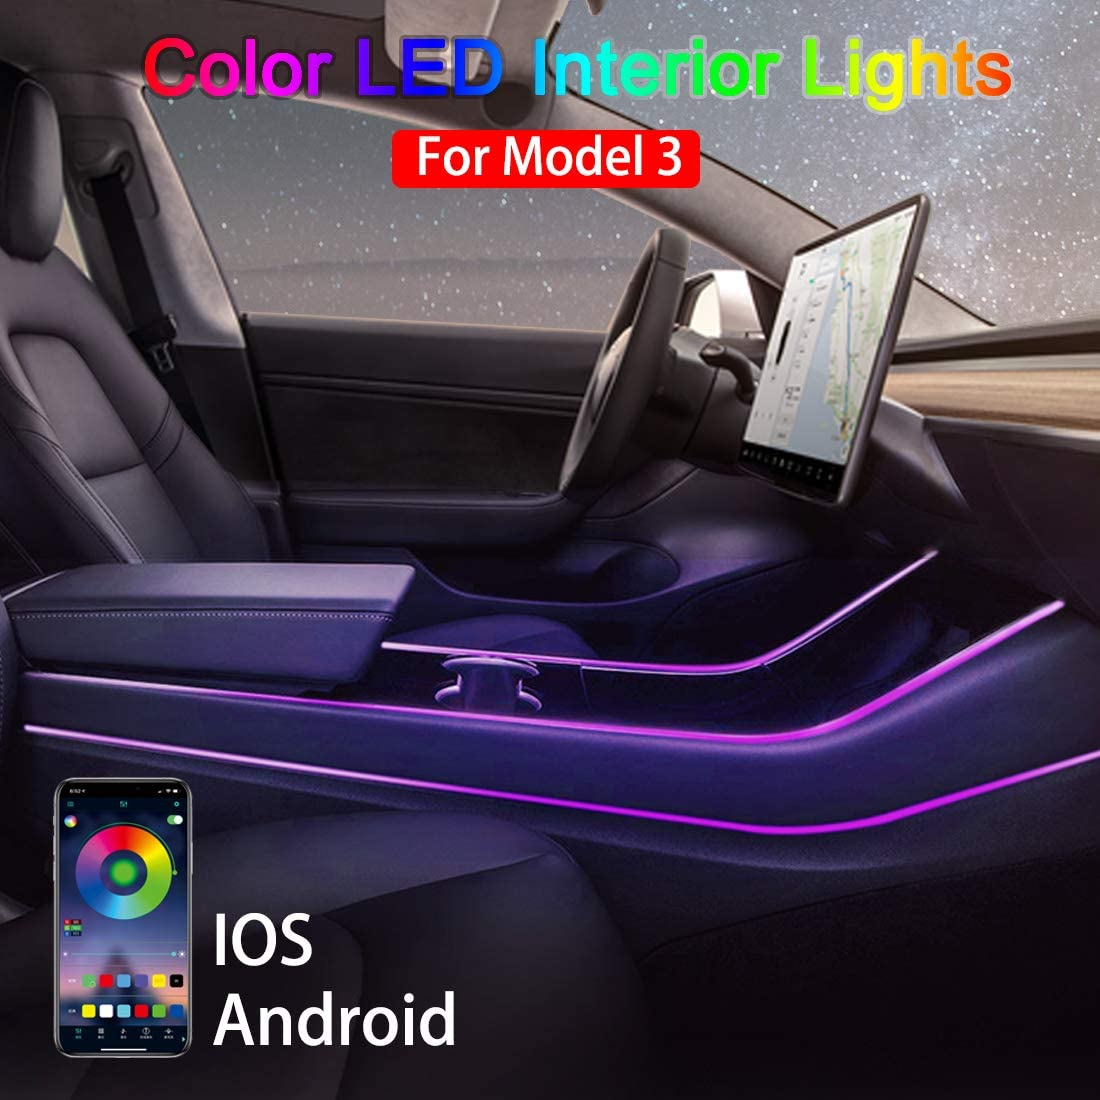 Model 3 Mood Lamp Car Center Console Atmosphere Light for Tesla Model 3, APP Controller Lighting Kits